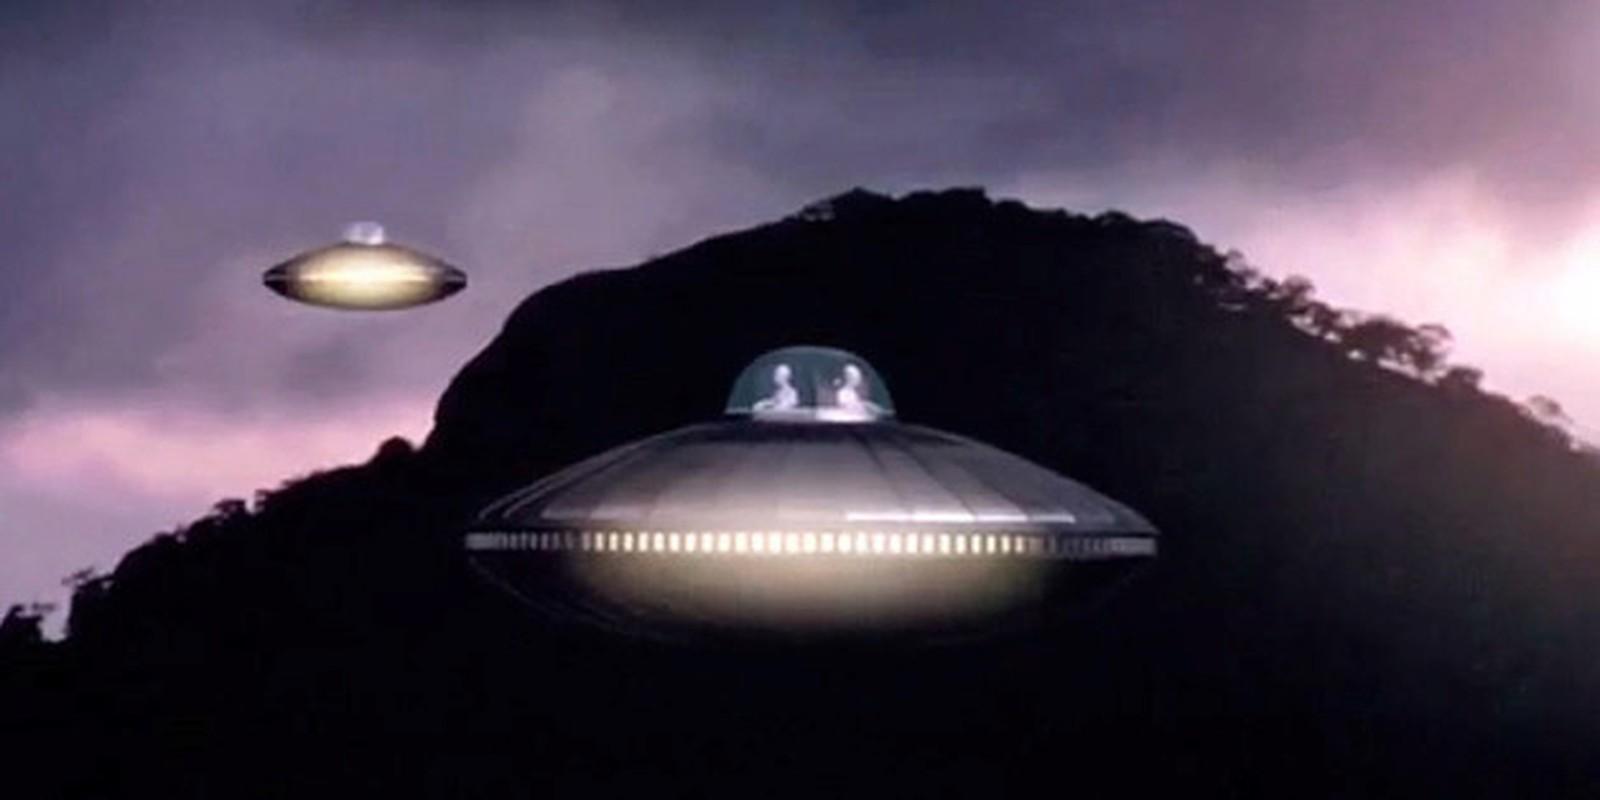 Van toc UFO cua nguoi ngoai hanh tinh khung khiep co nao?-Hinh-6